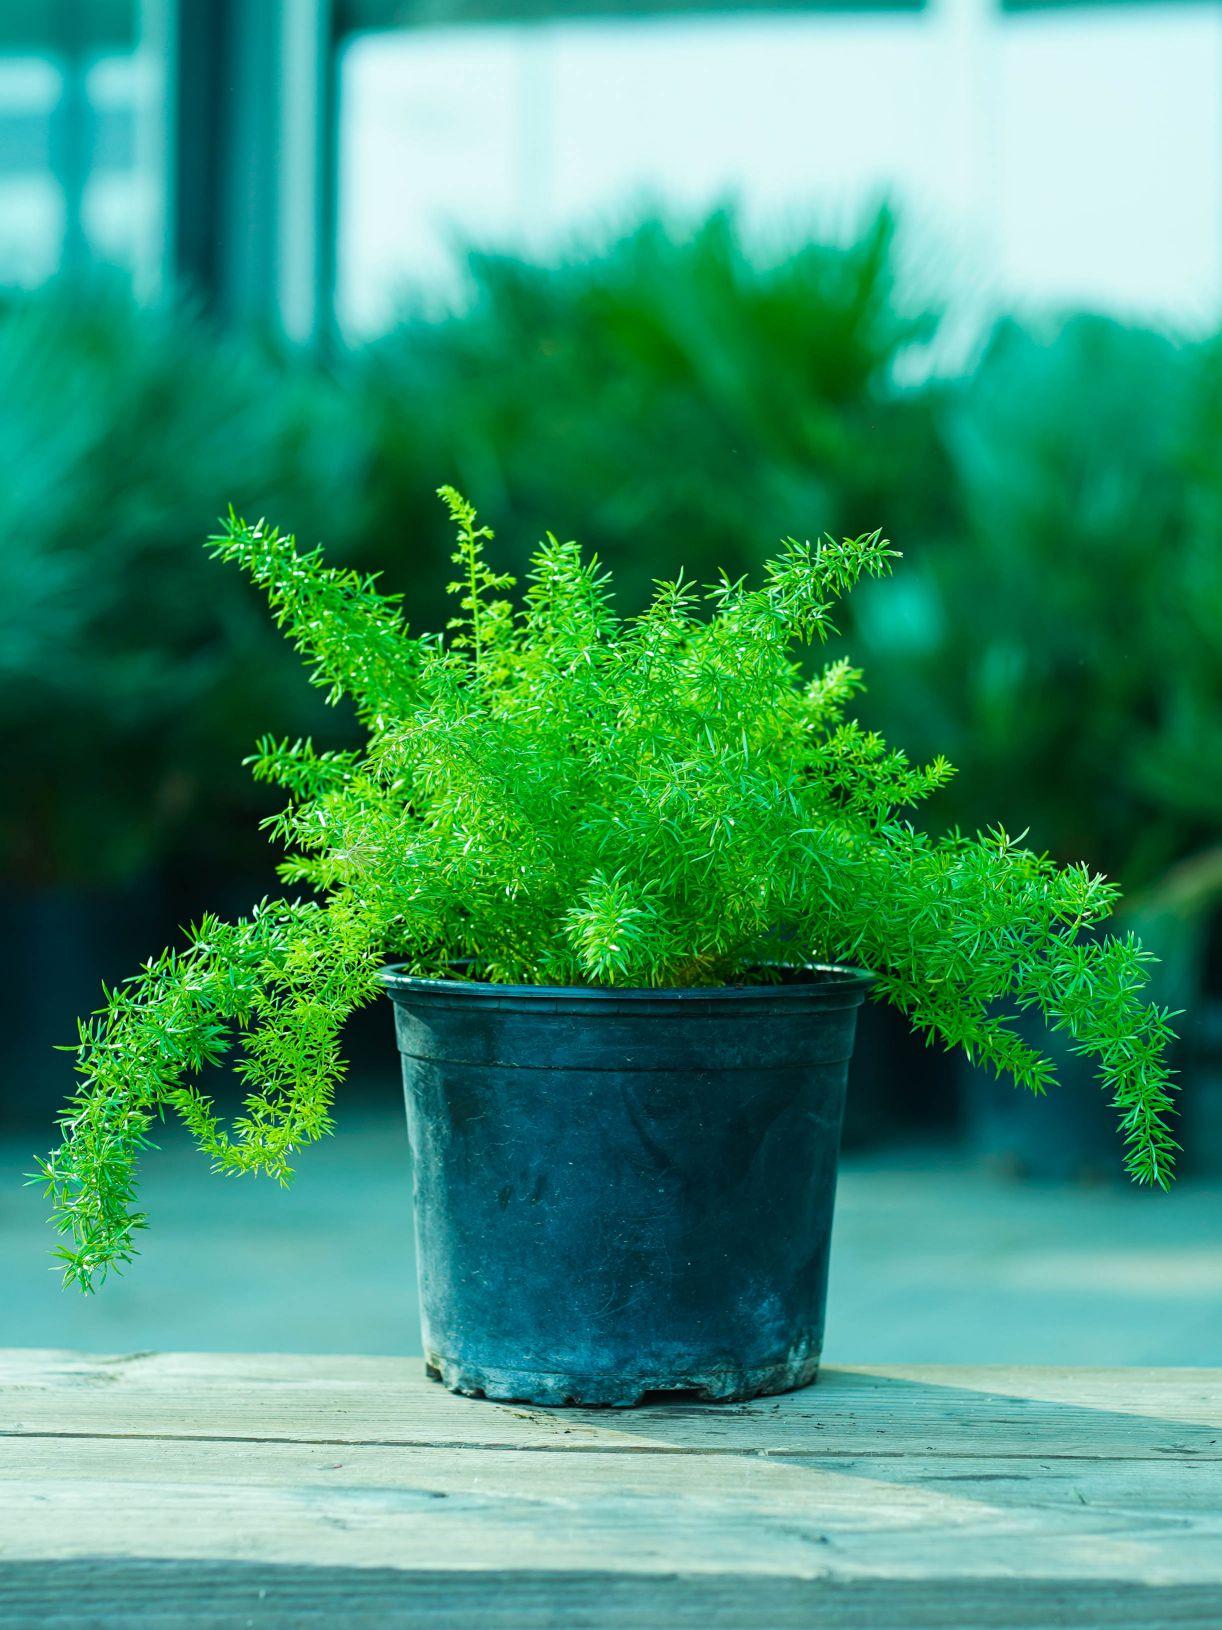 اسبراجوس الليوم نباتات خارجية